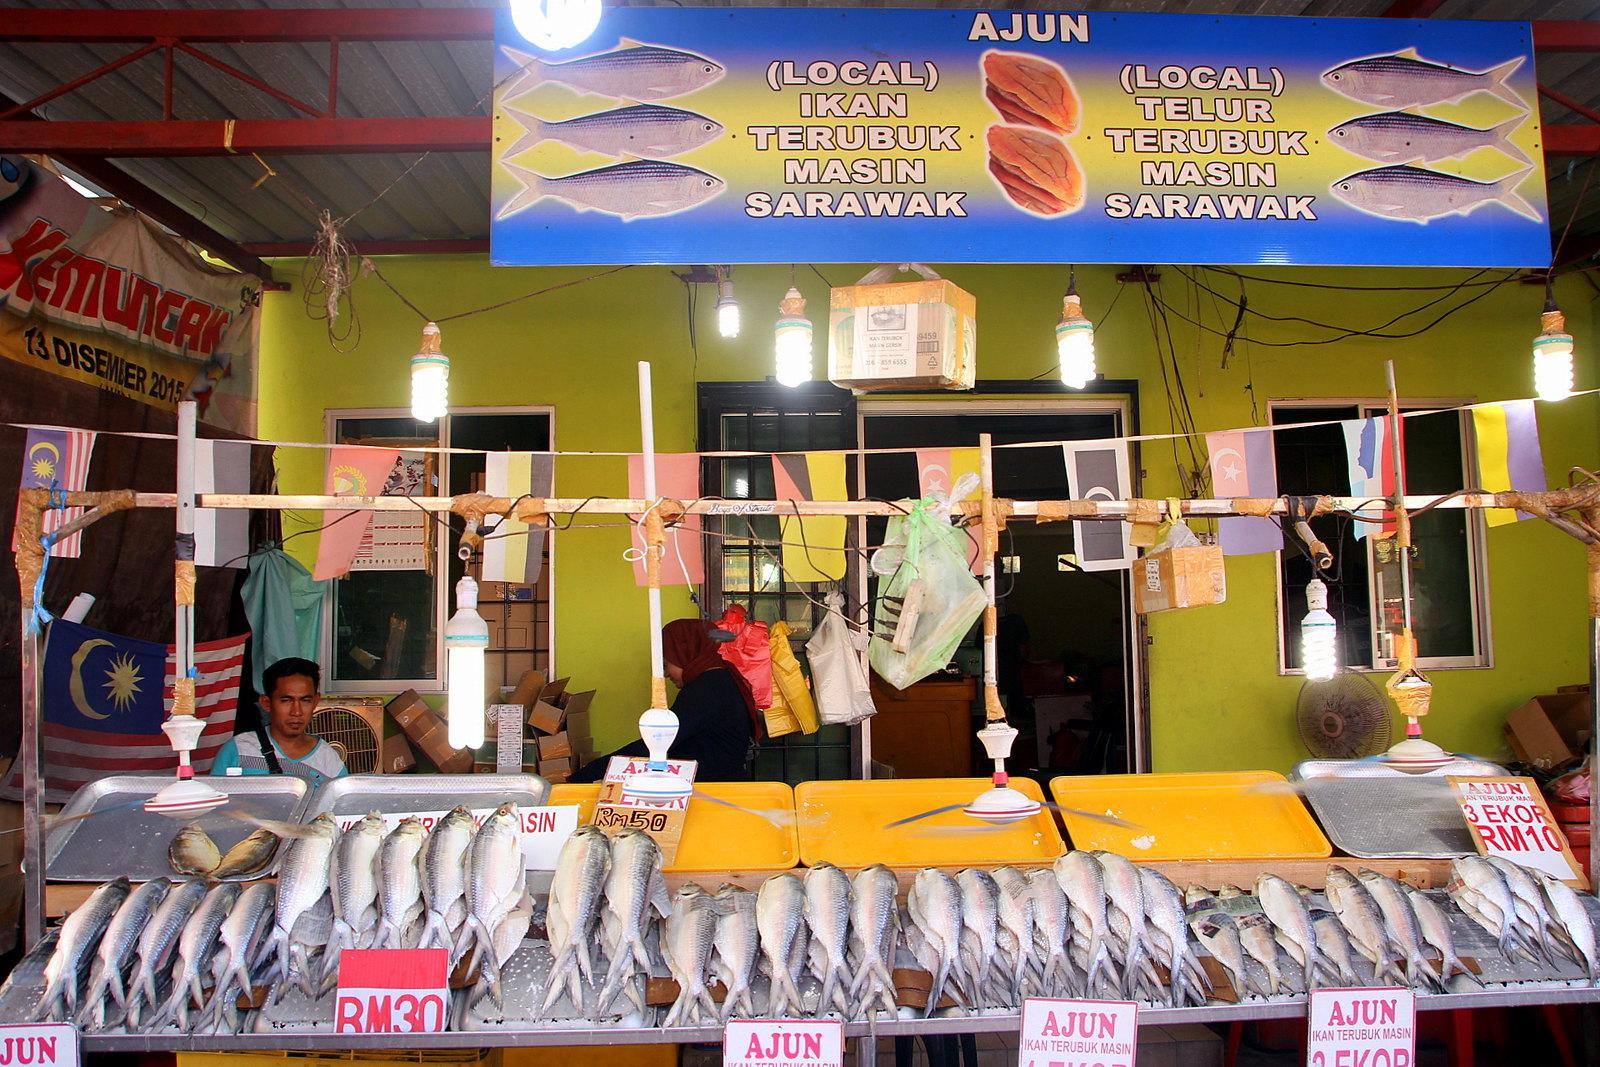 Ajun Ikan Terubuk Kuching